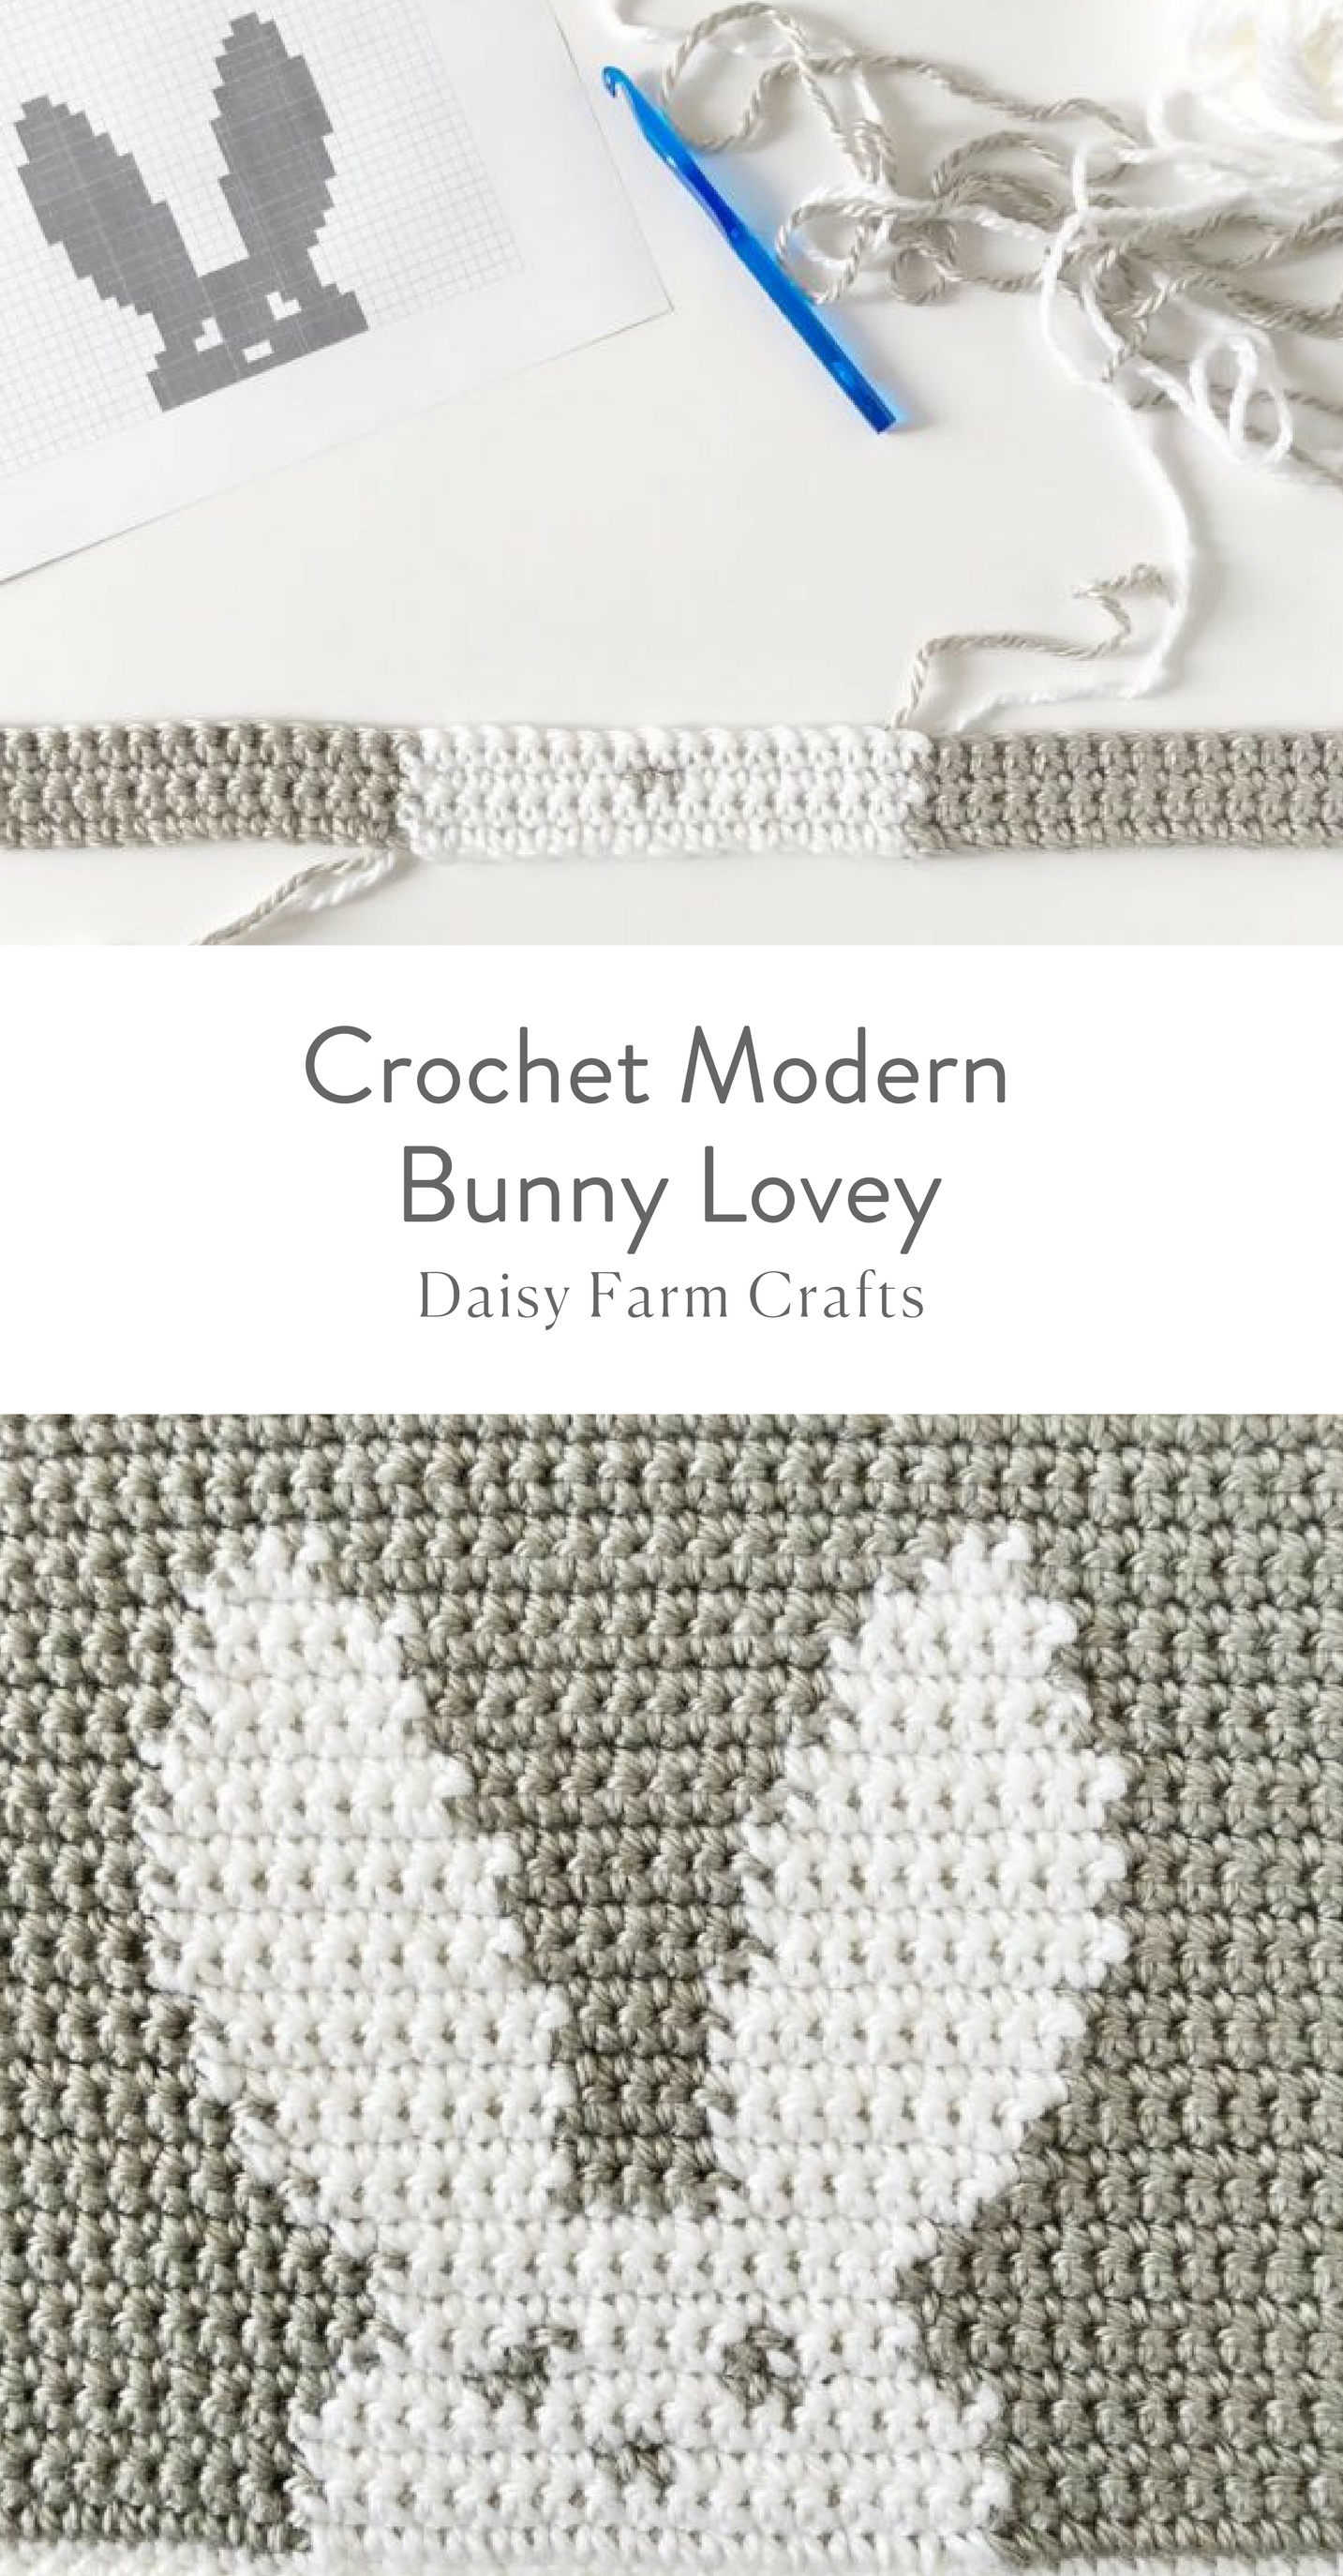 Free Pattern - Crochet Modern Bunny Lovey Blanket | crafts ...